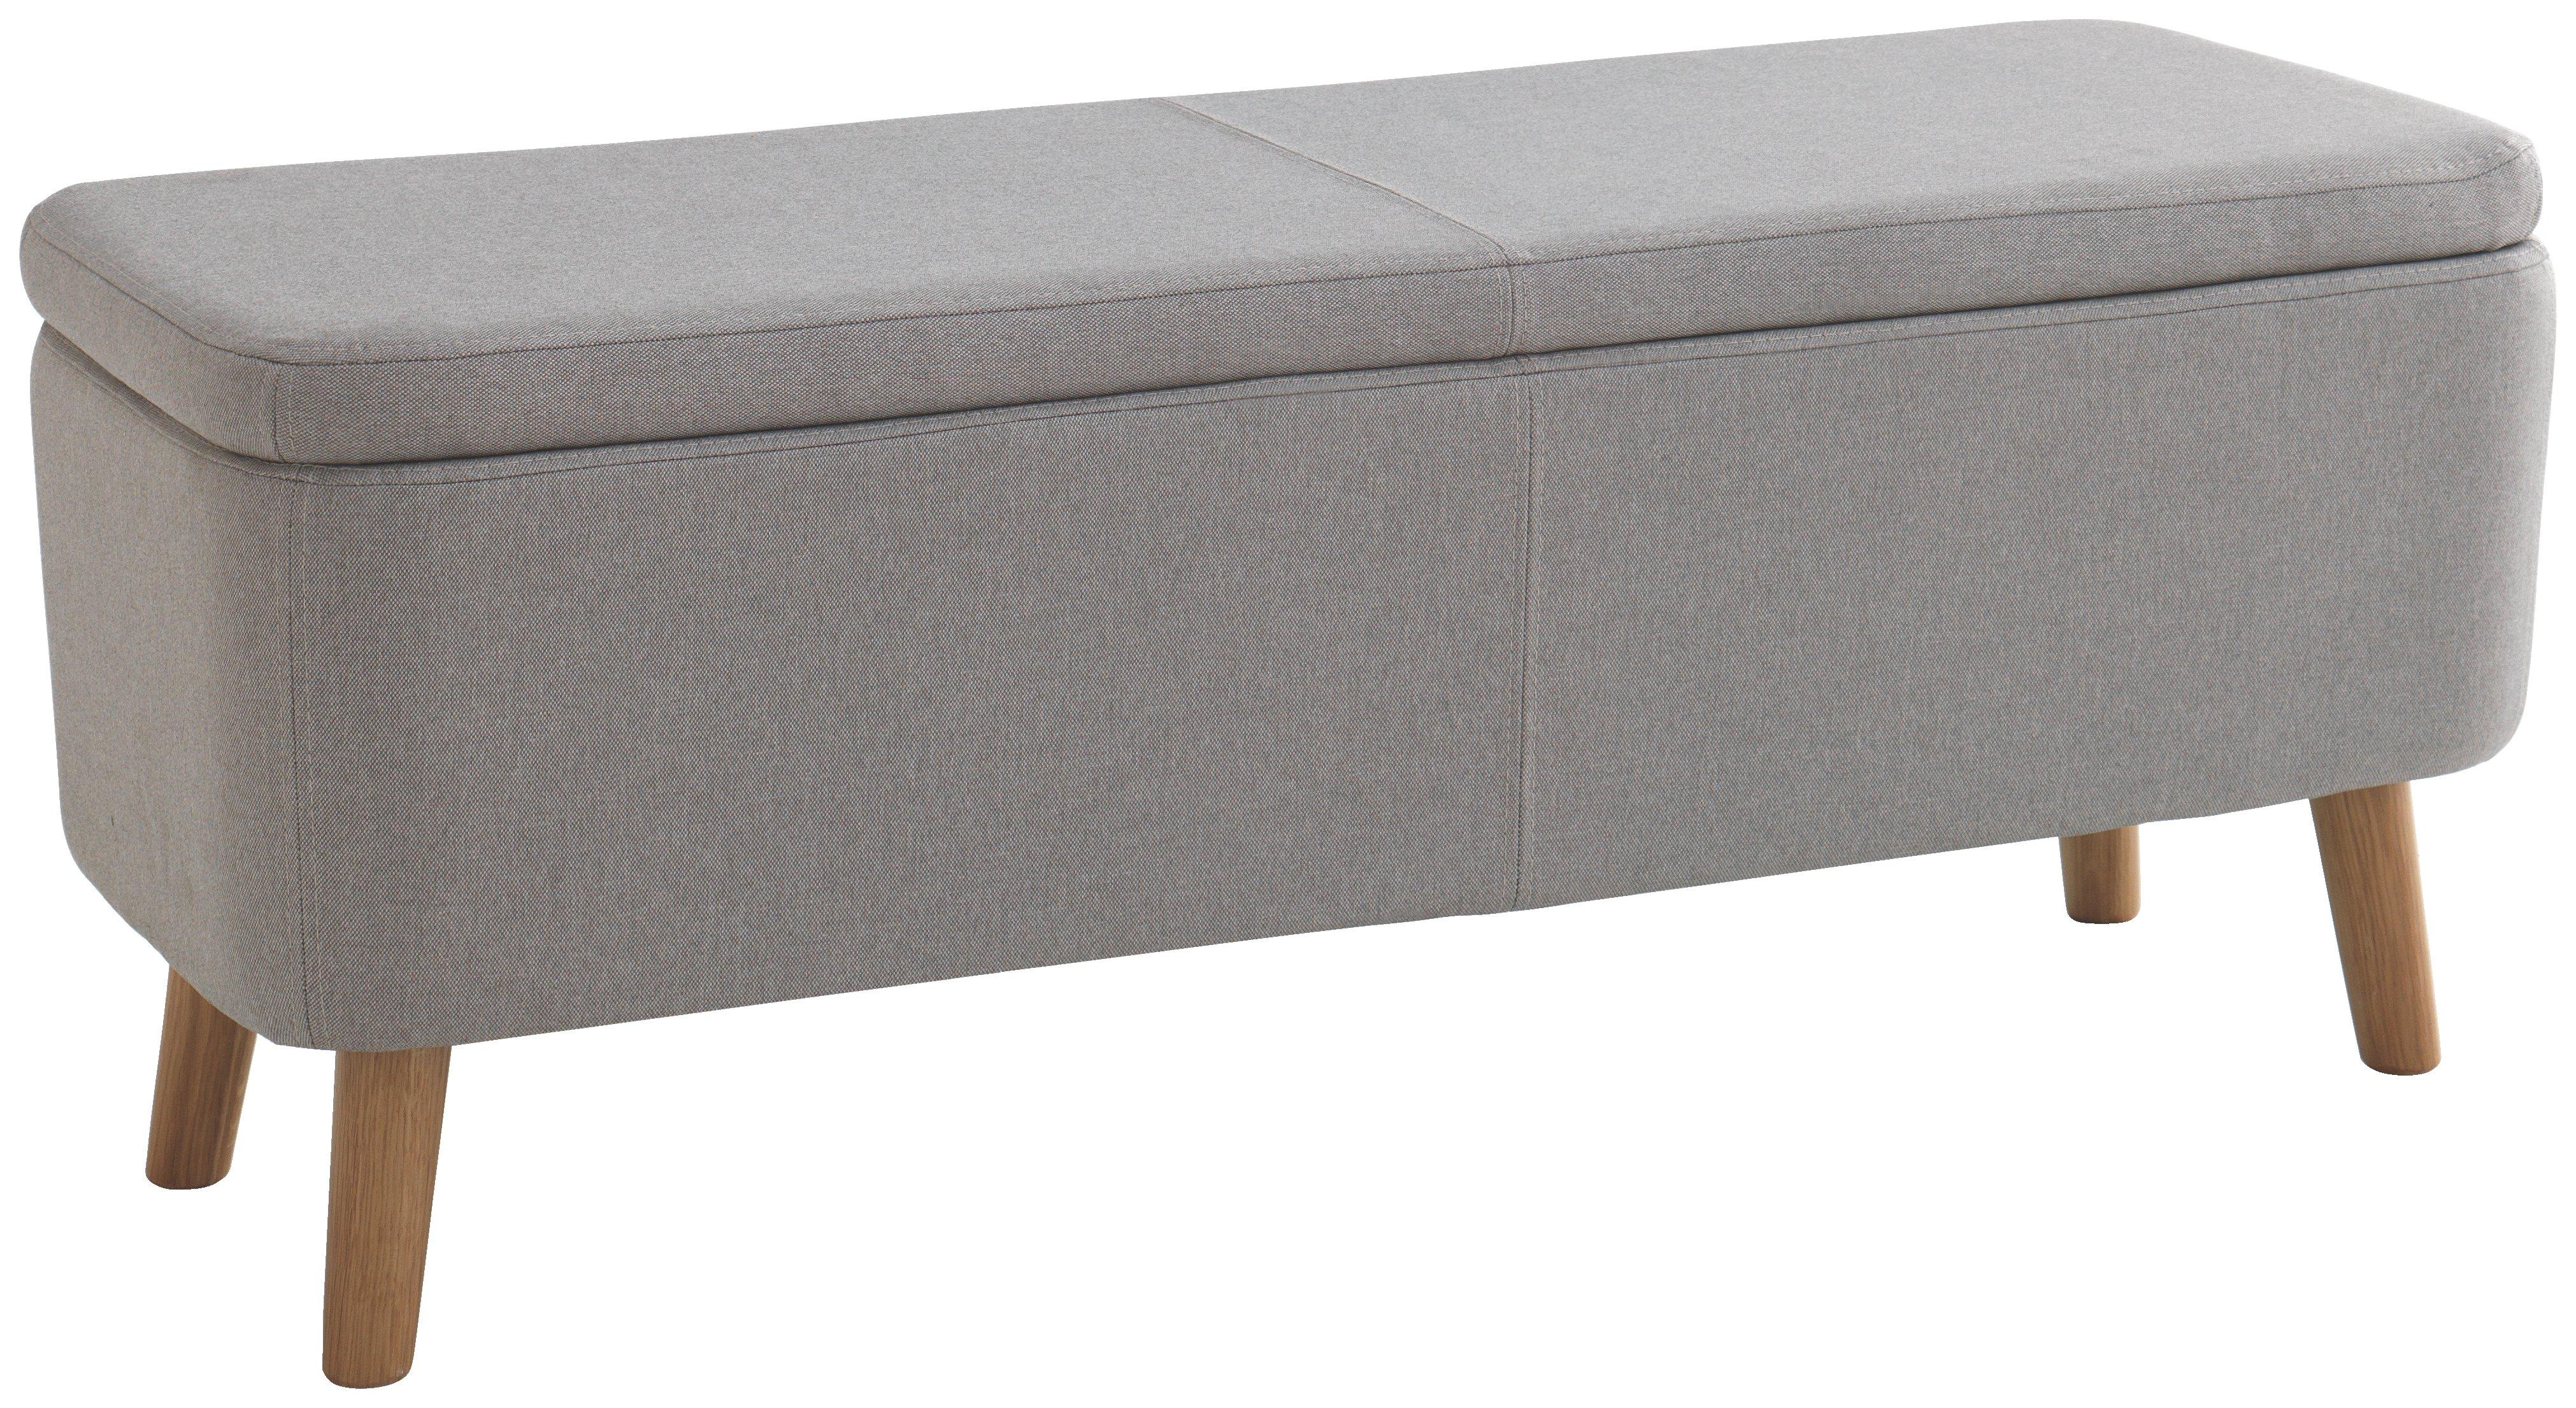 Buy Habitat Jacobs Upholstered Storage Bench Grey at Argoscouk